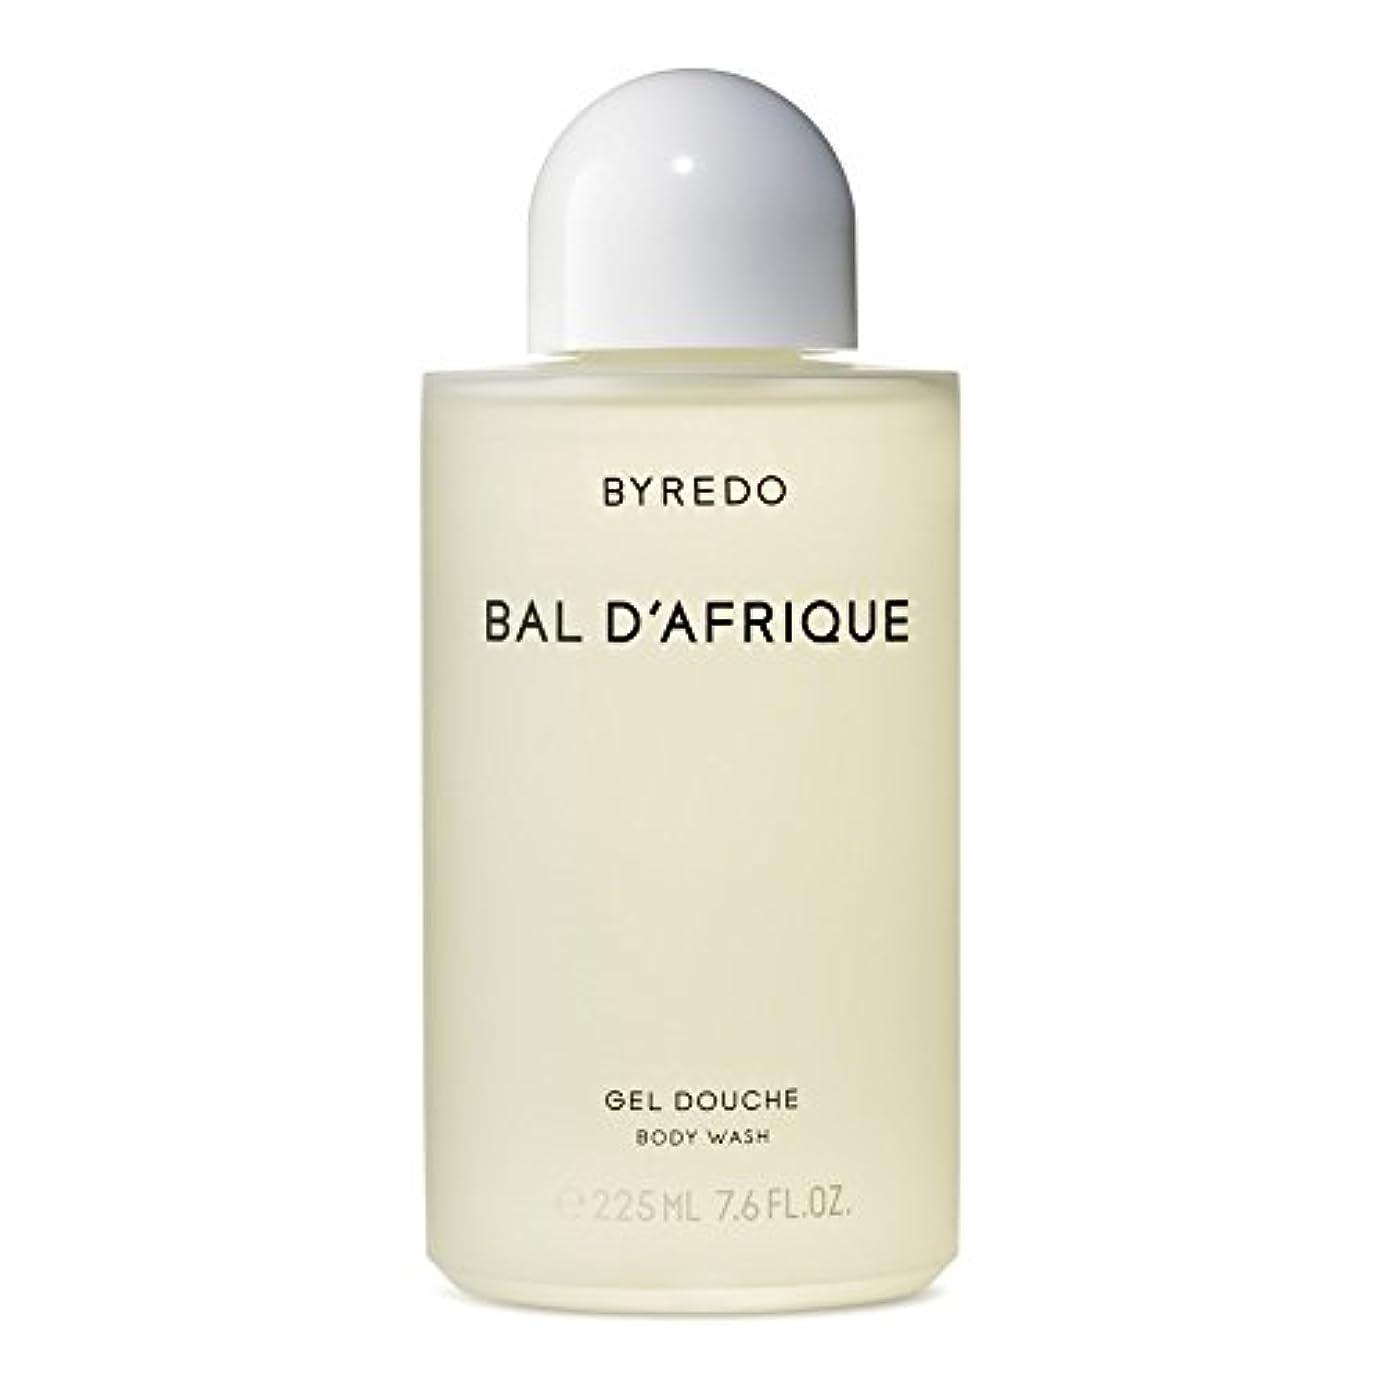 Byredo Bal d'Afrique Body Wash 225ml (Pack of 6) - 'のボディウォッシュ225ミリリットル x6 [並行輸入品]